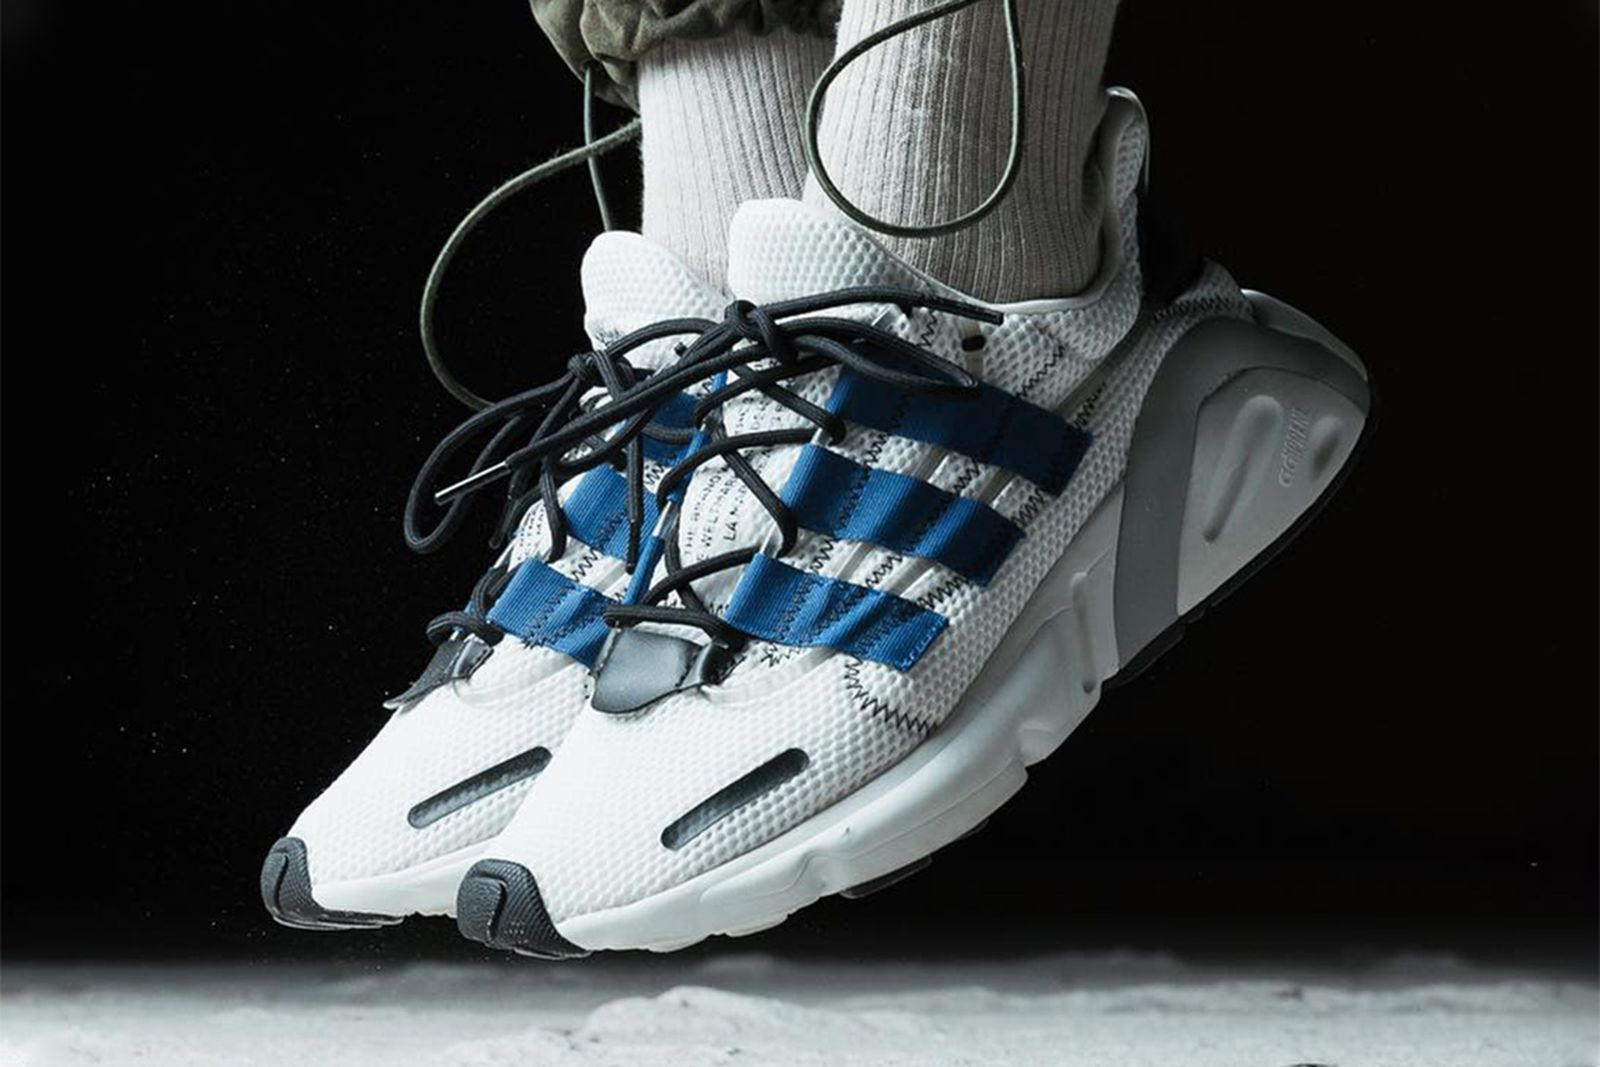 Educación moral Aniquilar crimen  adidas LXCON & More of the Best Instagram Sneakers